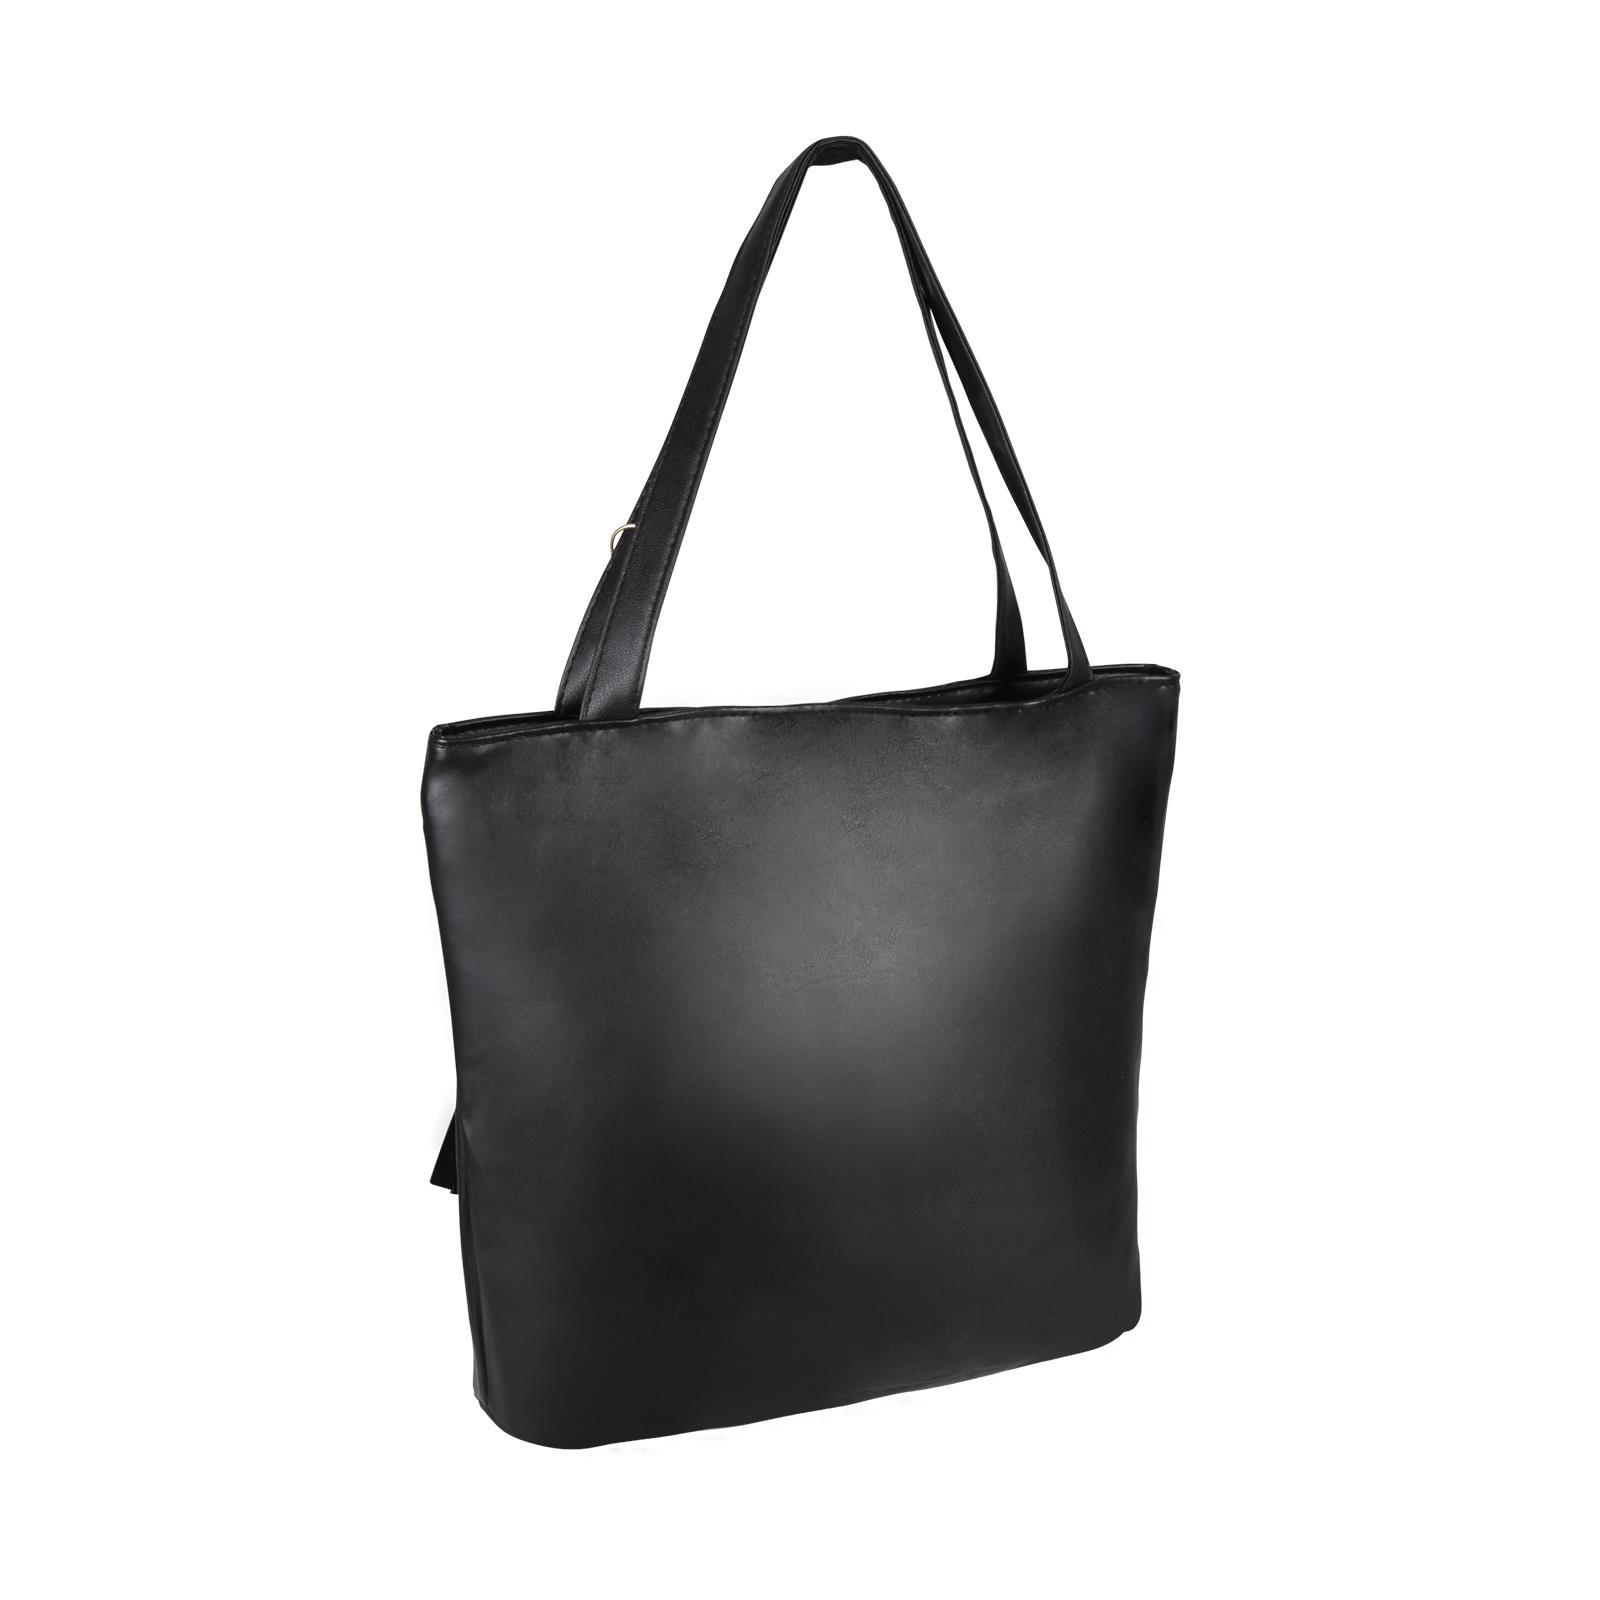 Animal-Print-Handbag-PU-Leather-Shoulder-Bag-Work-Office-Tote-Shopper-Fashion thumbnail 4